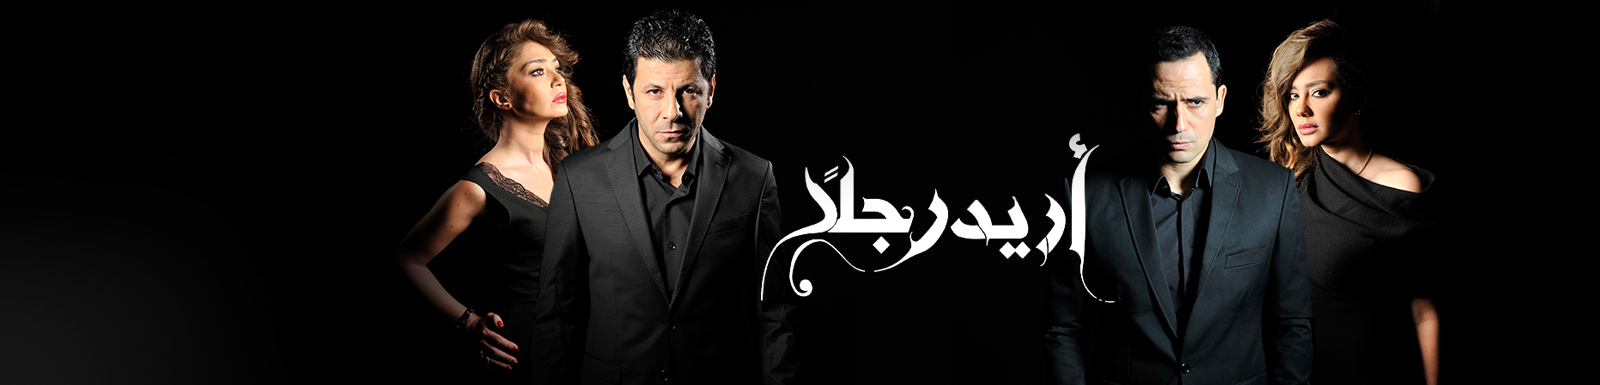 ����� ����� ���� ���� ������ 36 MBC shahid ���� ��